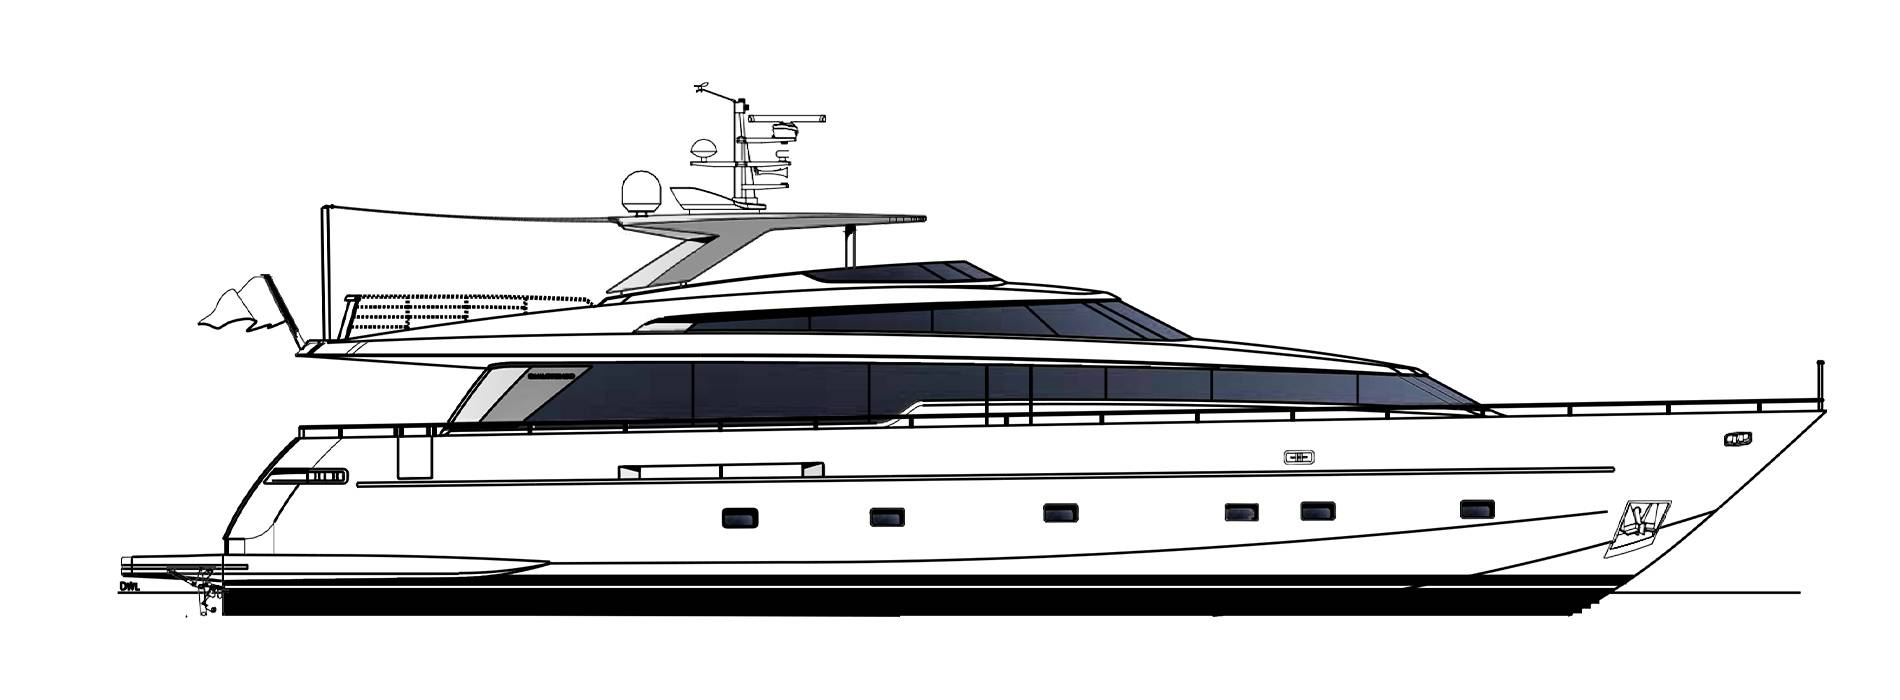 Sanlorenzo Yachts SL96-623 Профиль